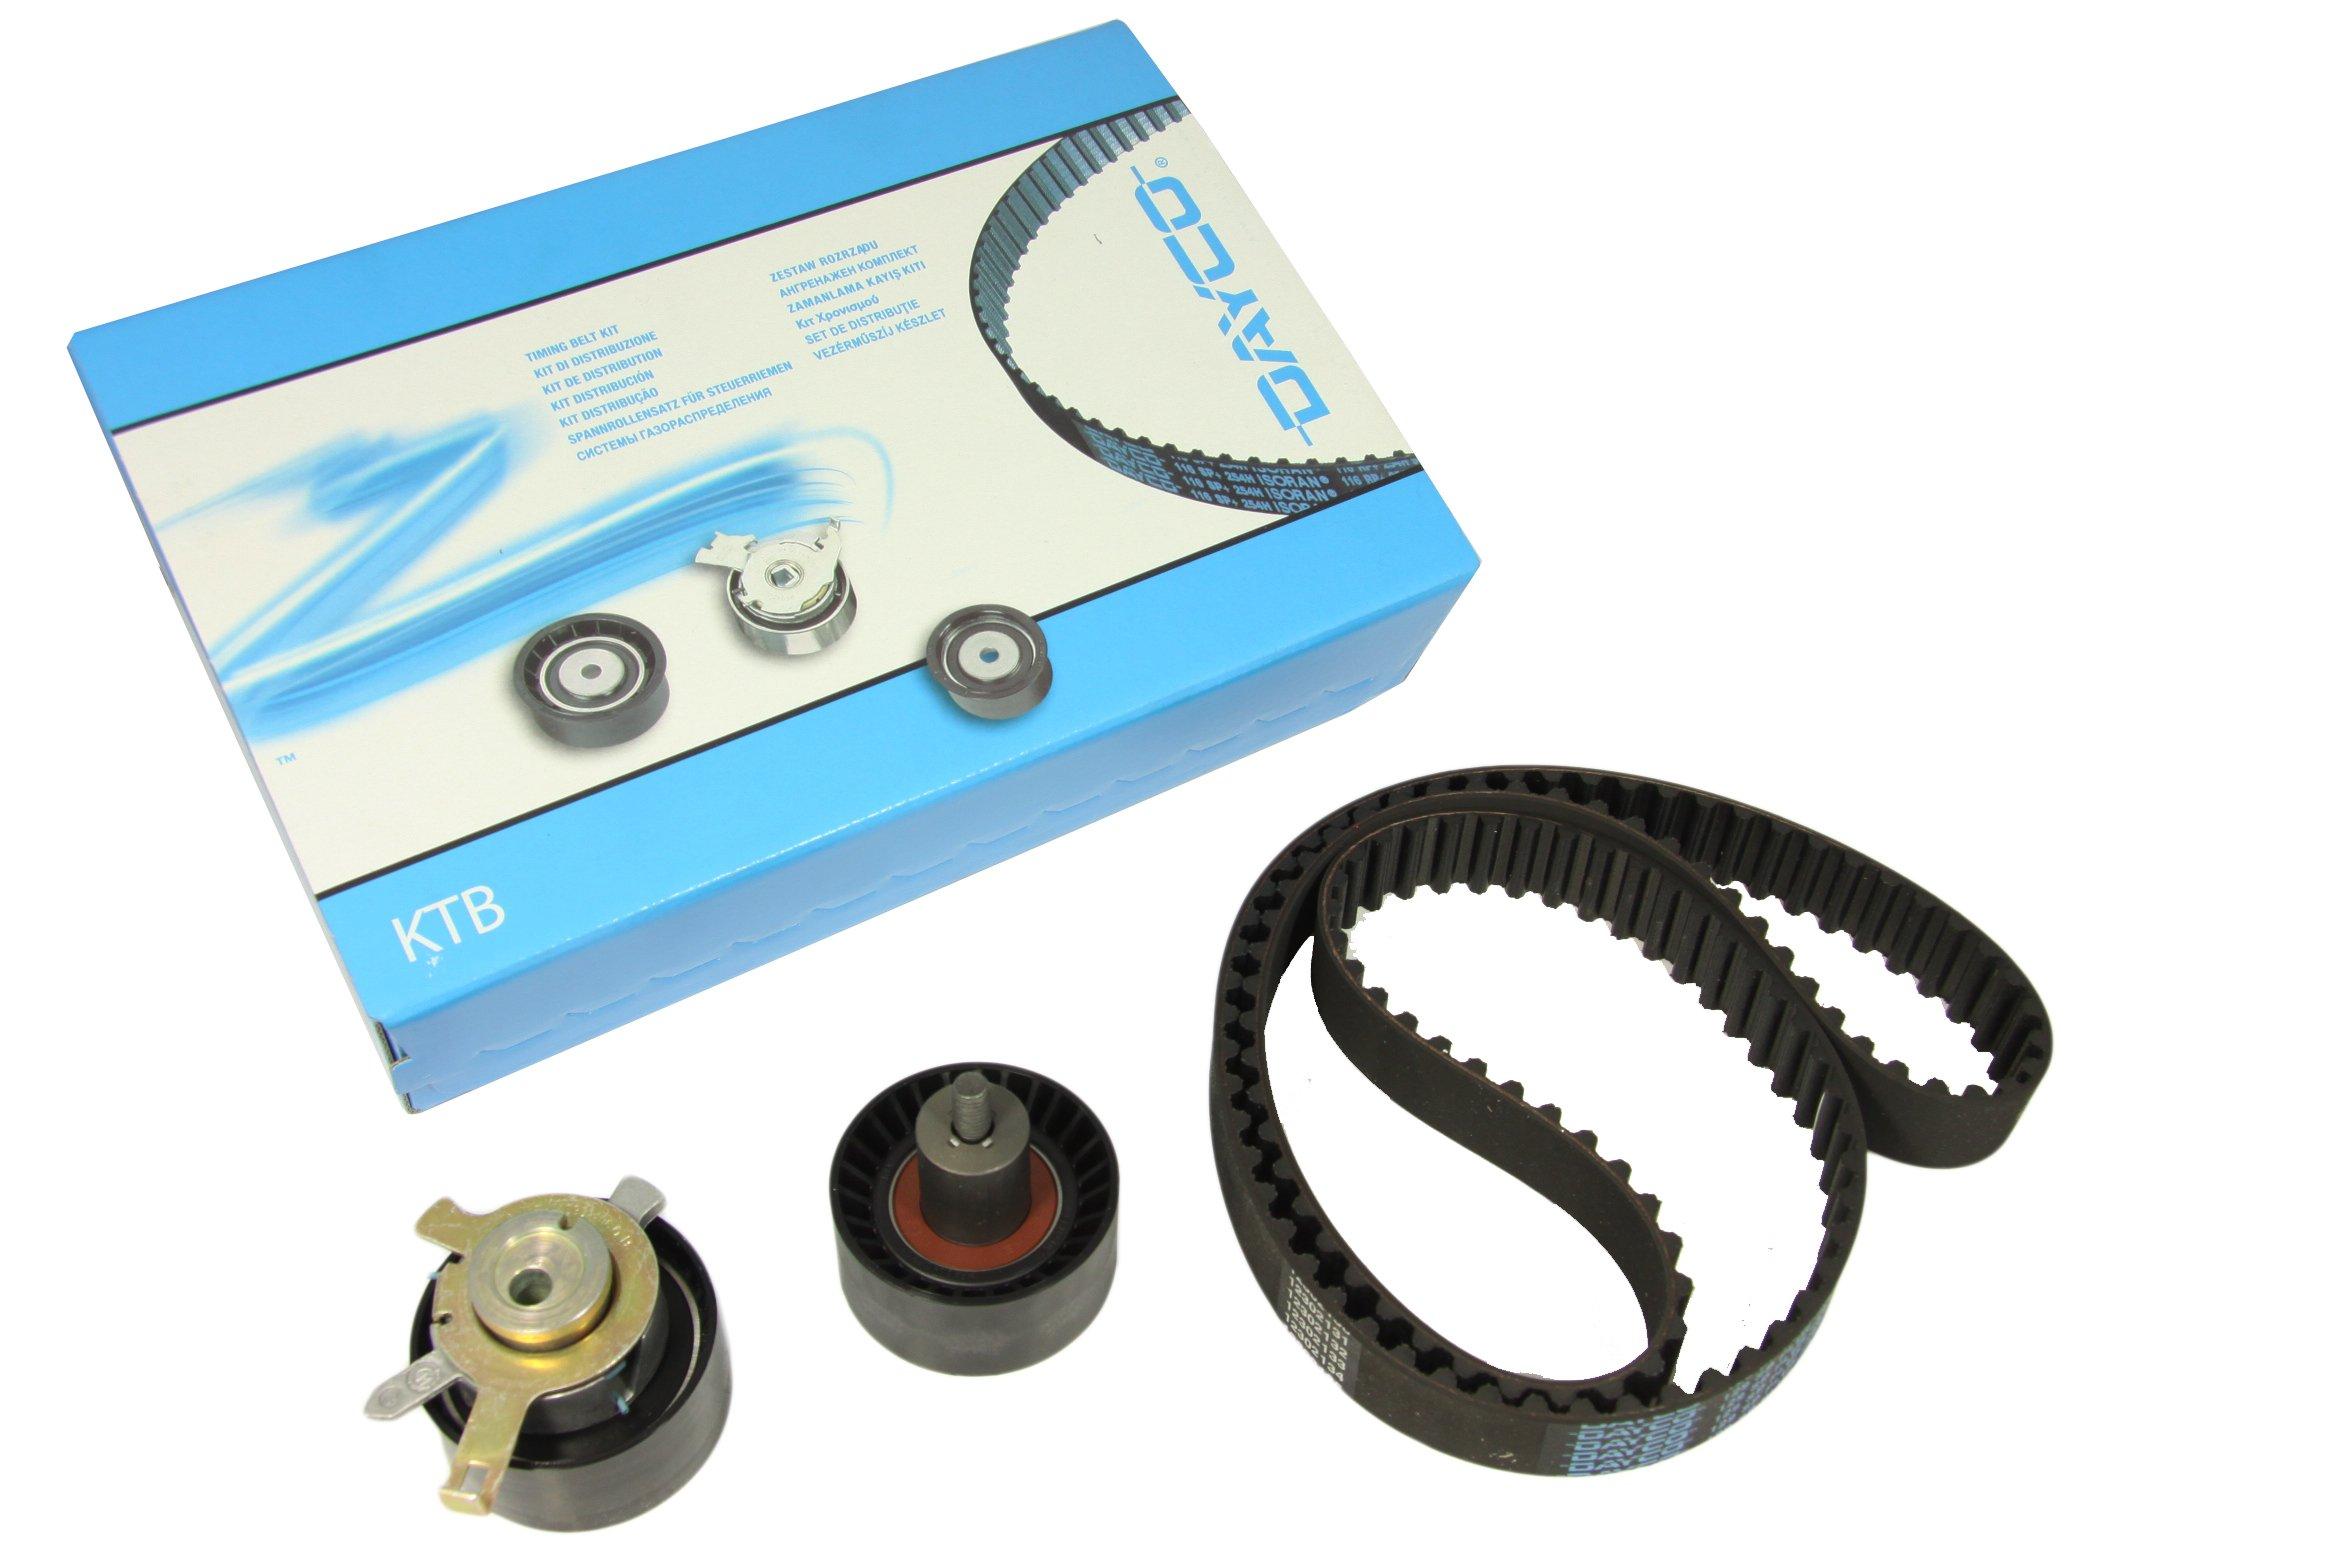 KTB286 Brand New Dayco Timing Belt Kit Set Part No